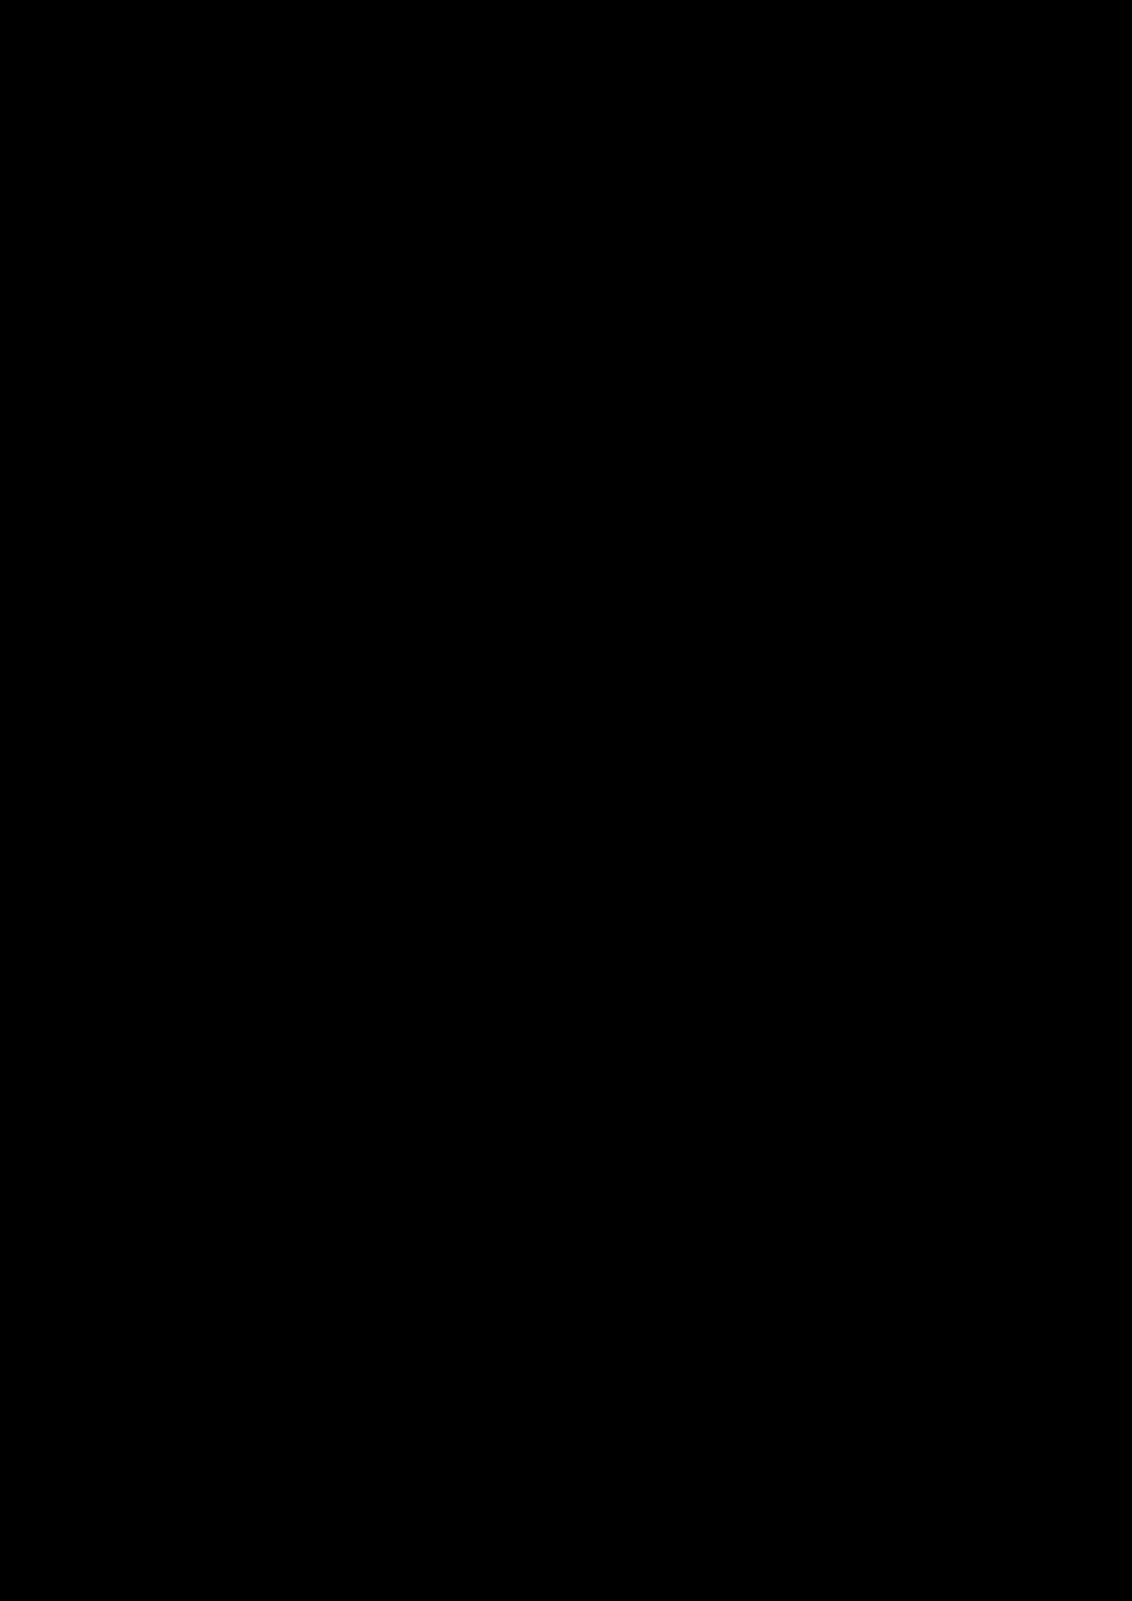 Prosti slide, Image 36